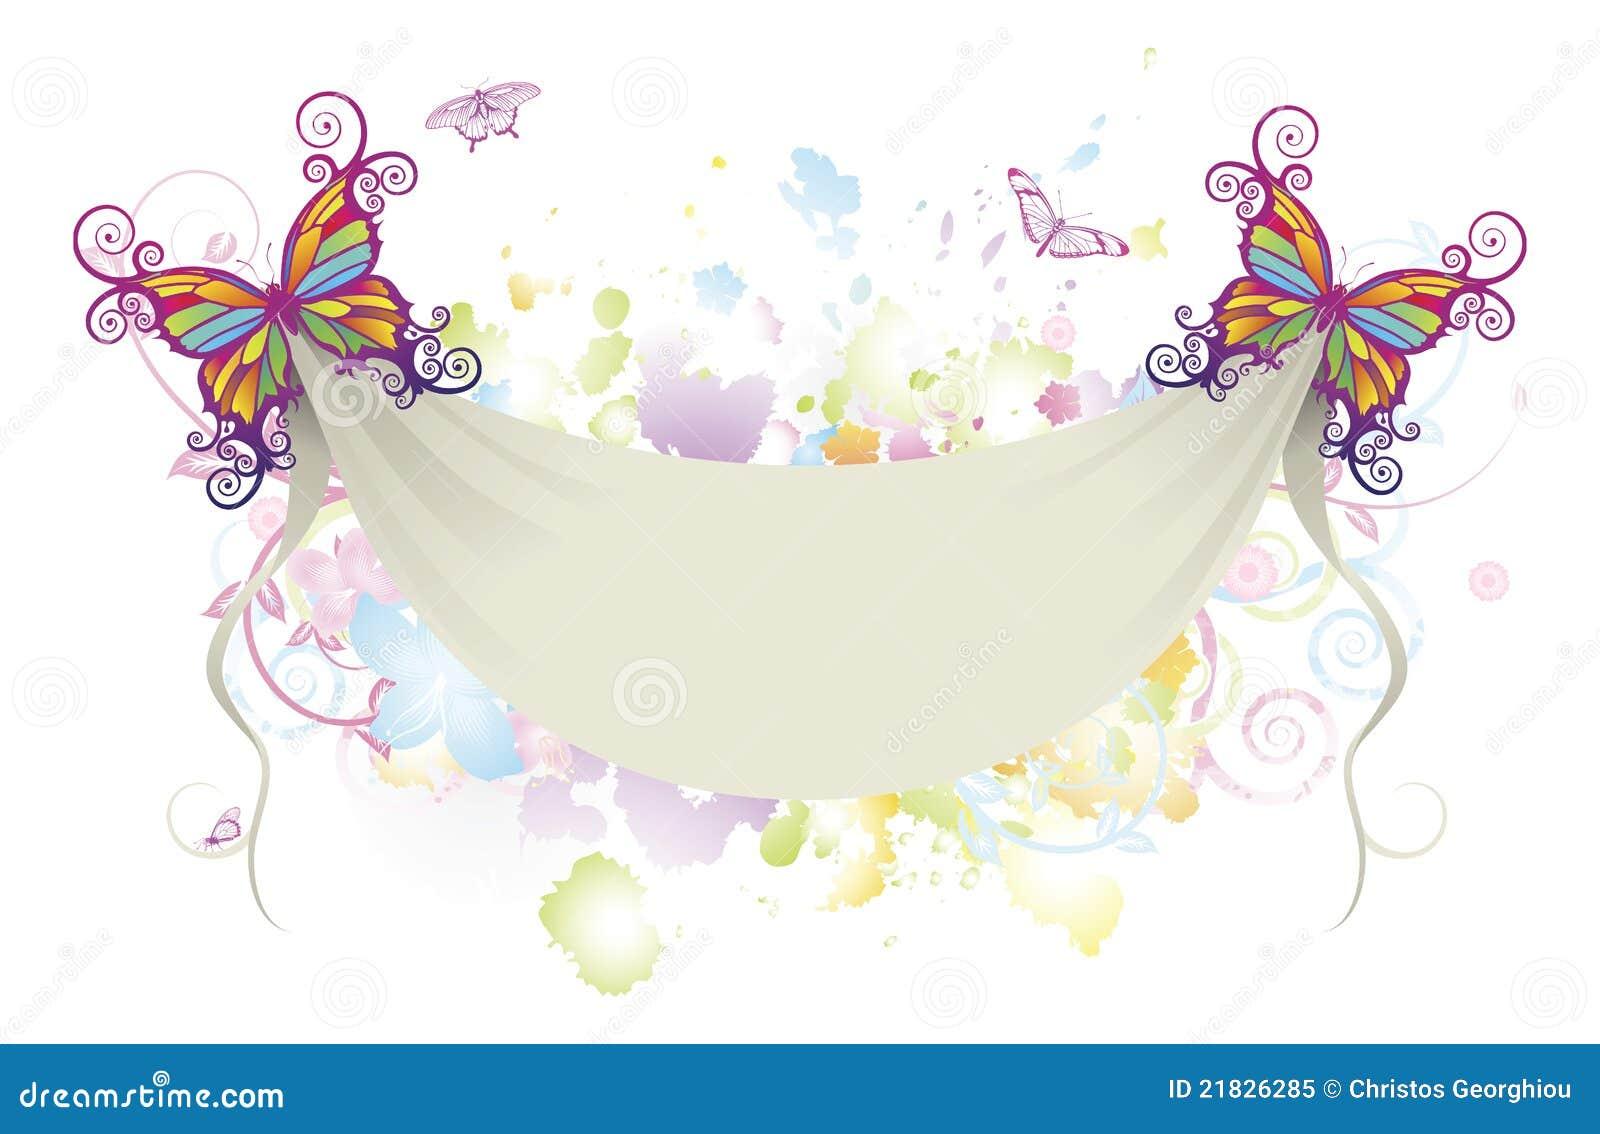 Scroll Design Wedding Invitations as great invitation template